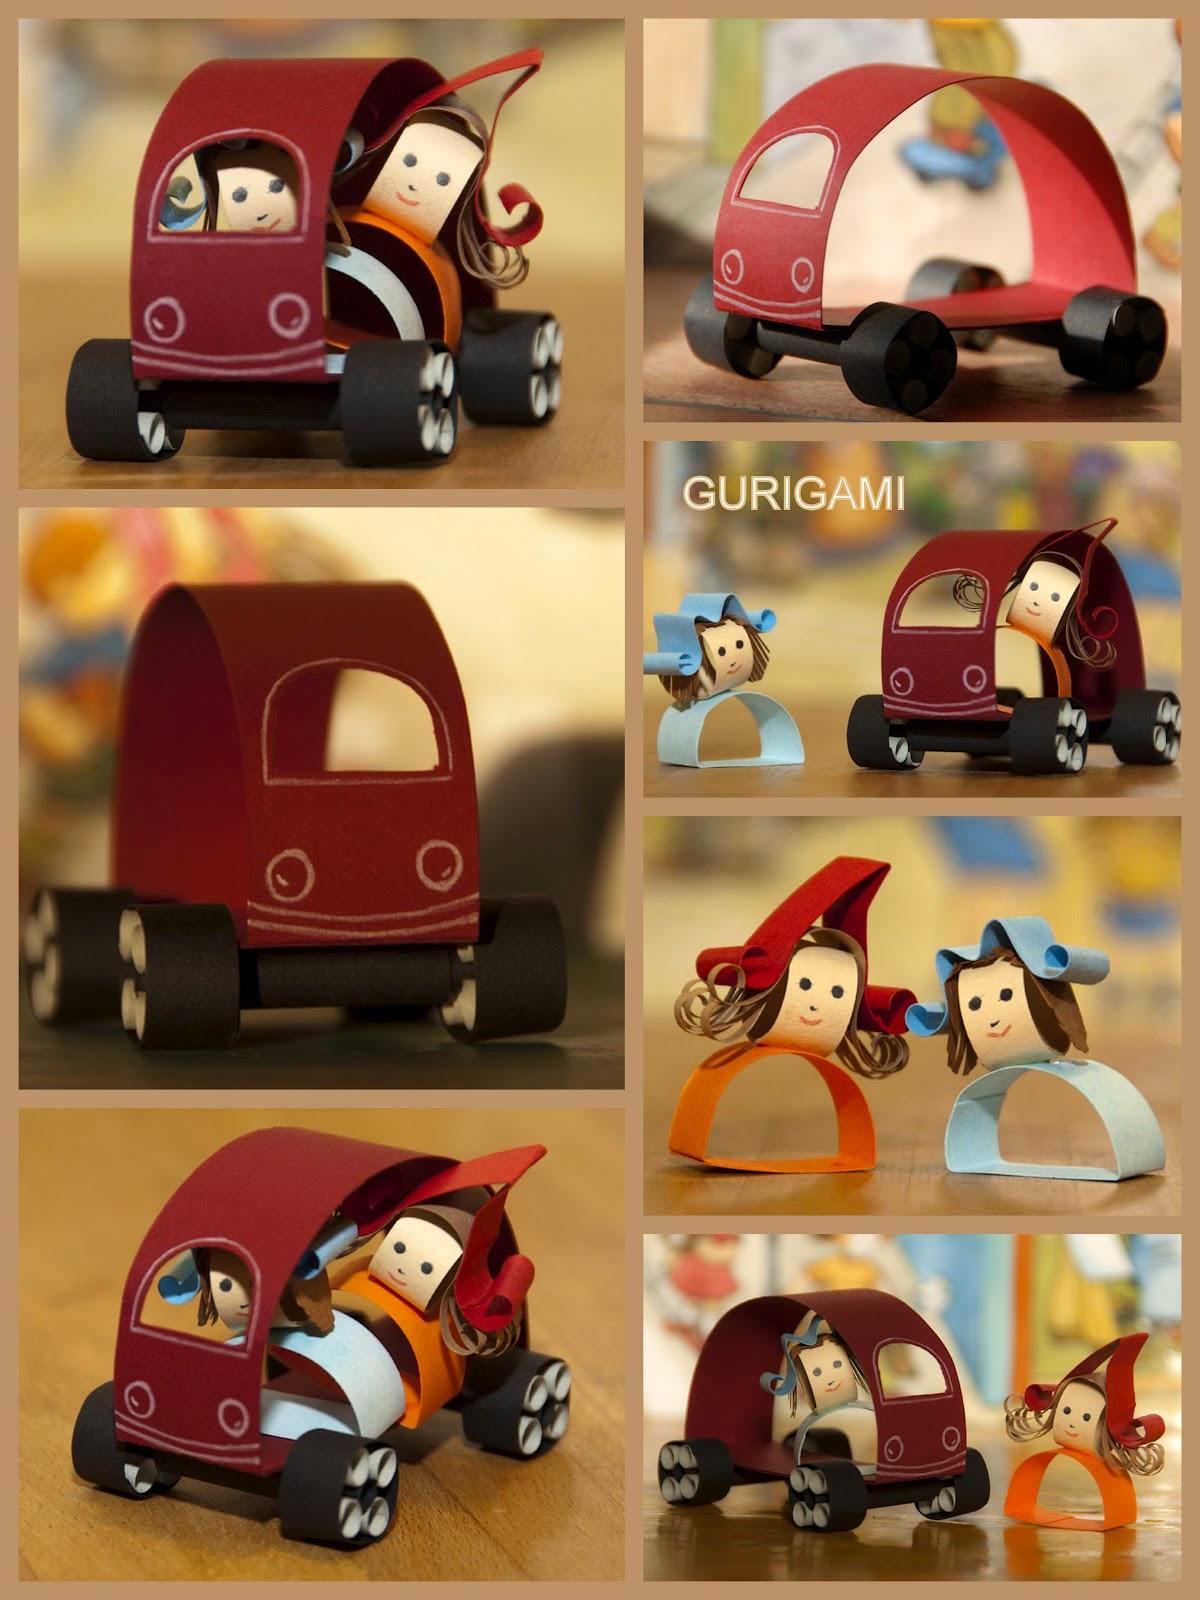 Gurigami. Petites voitures en papier.